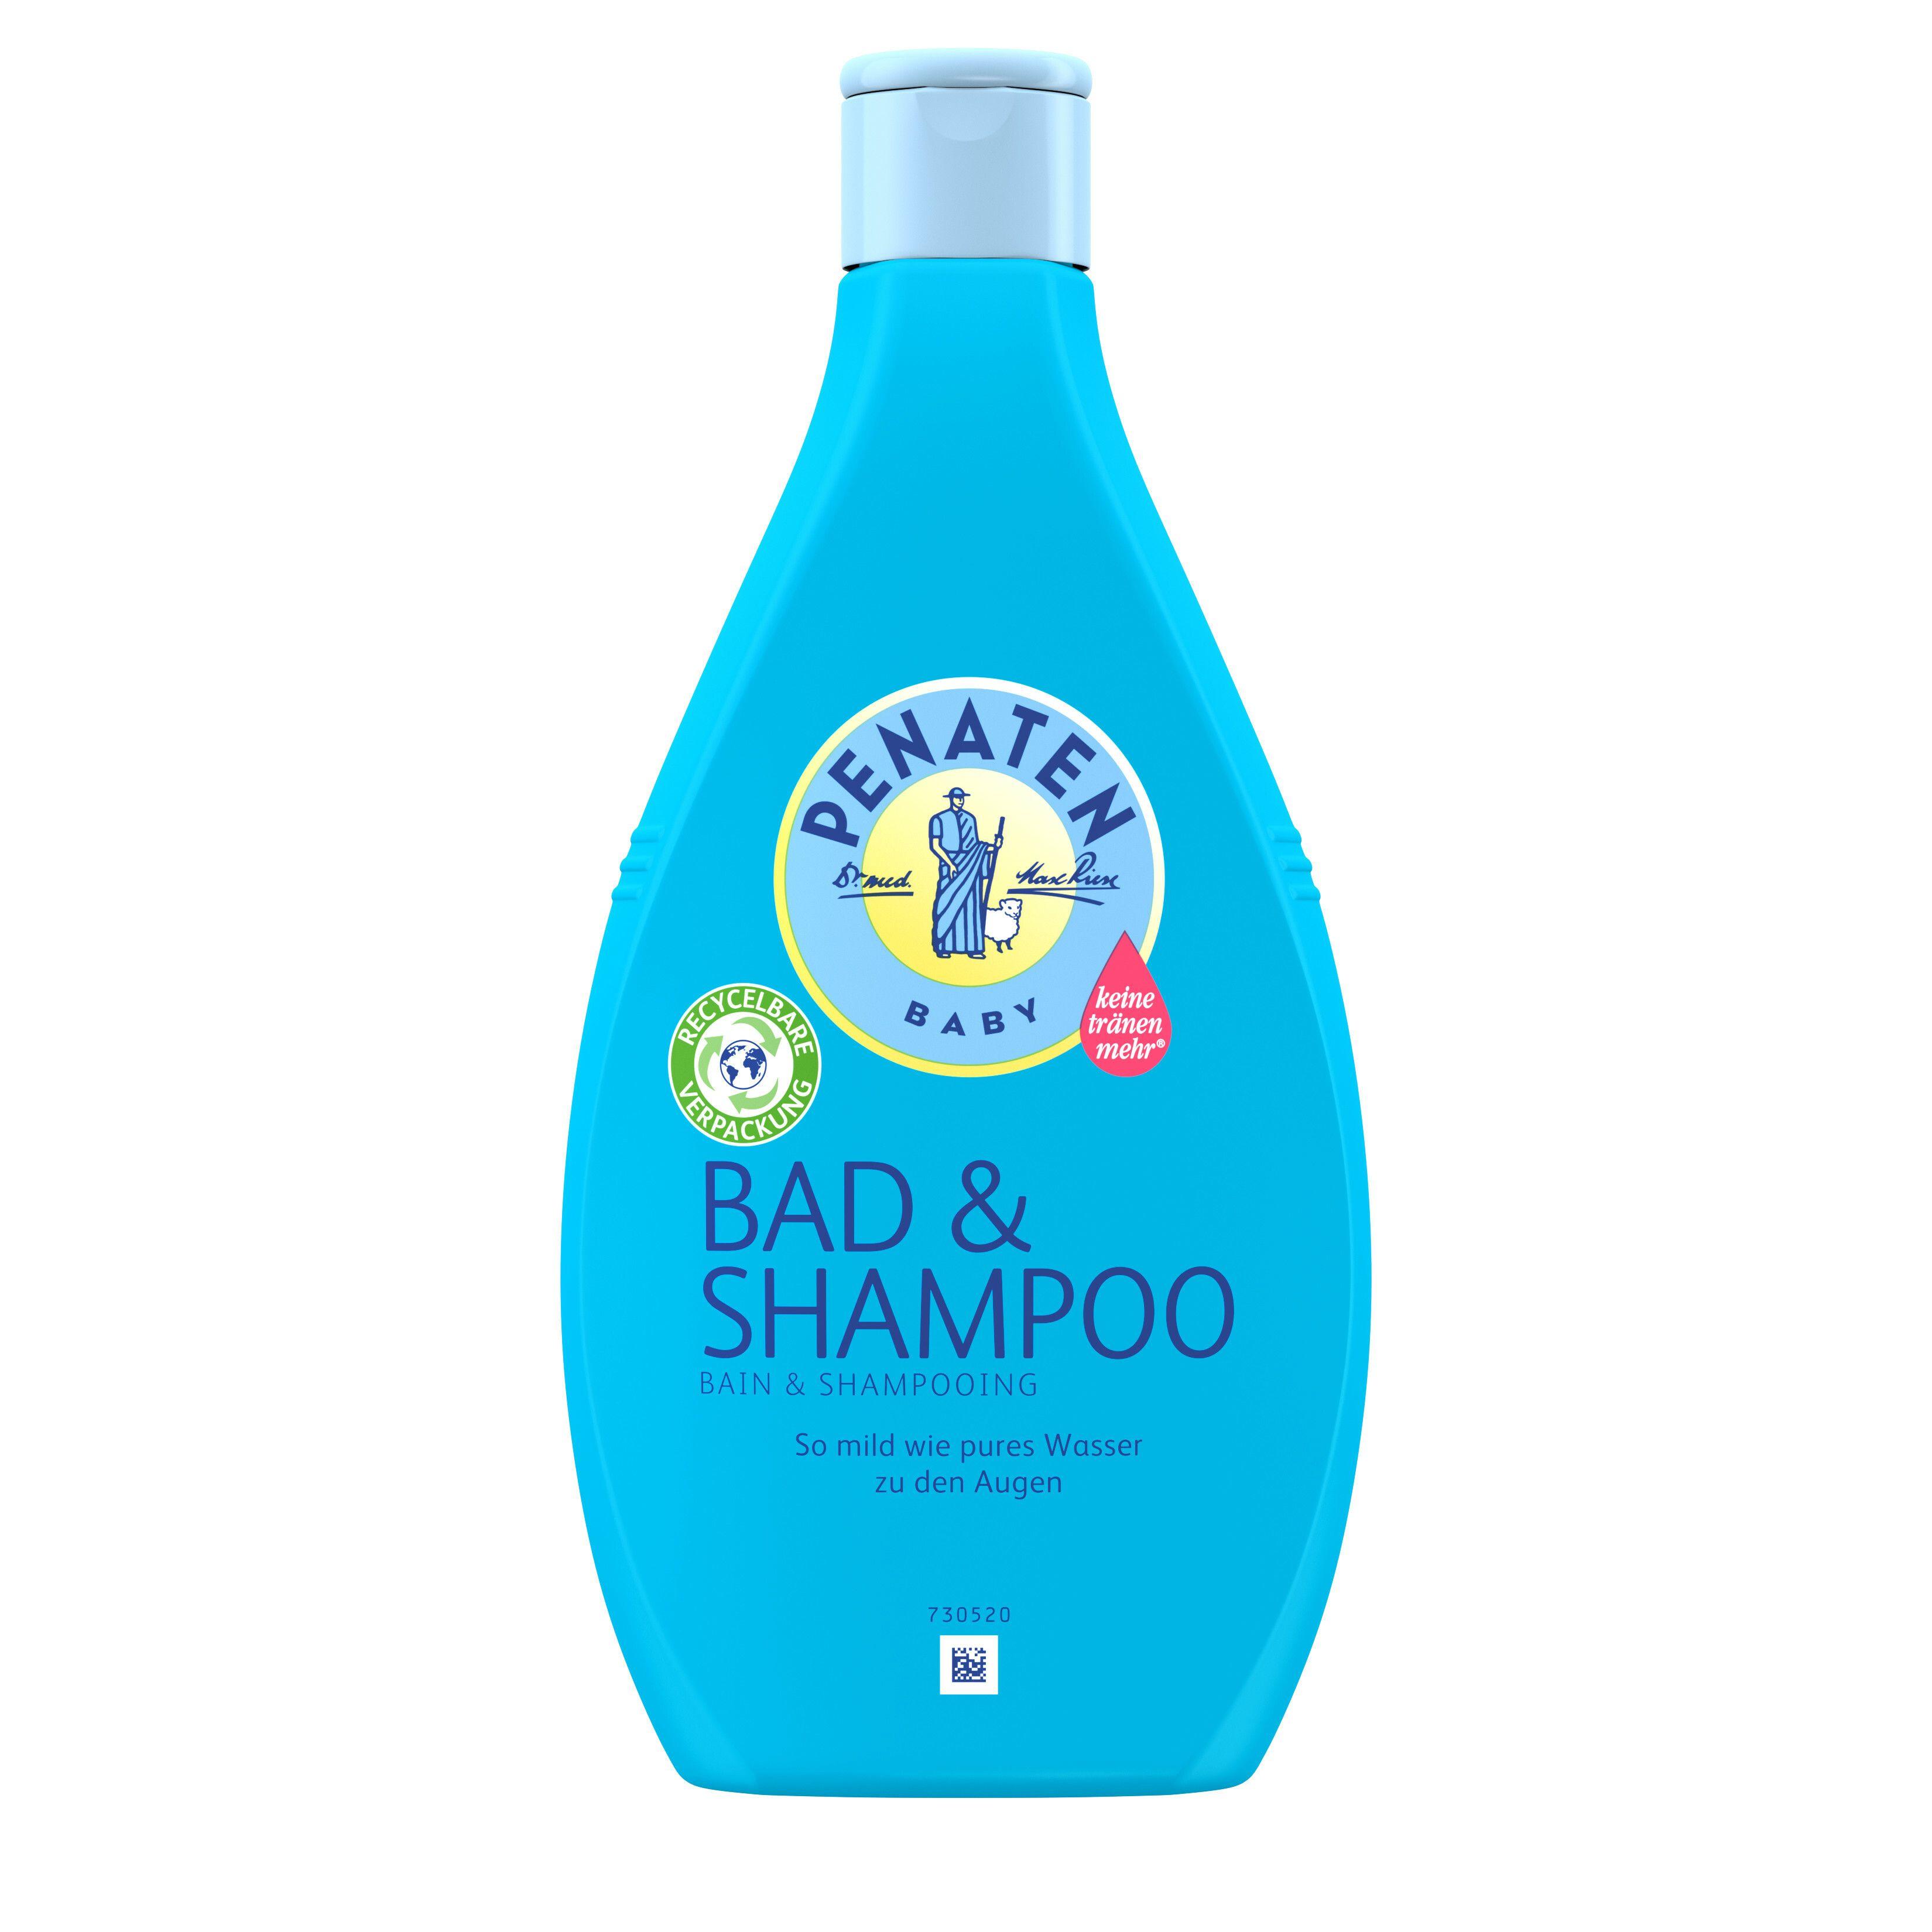 Image of PENATEN® BABY Bad & Shampoo